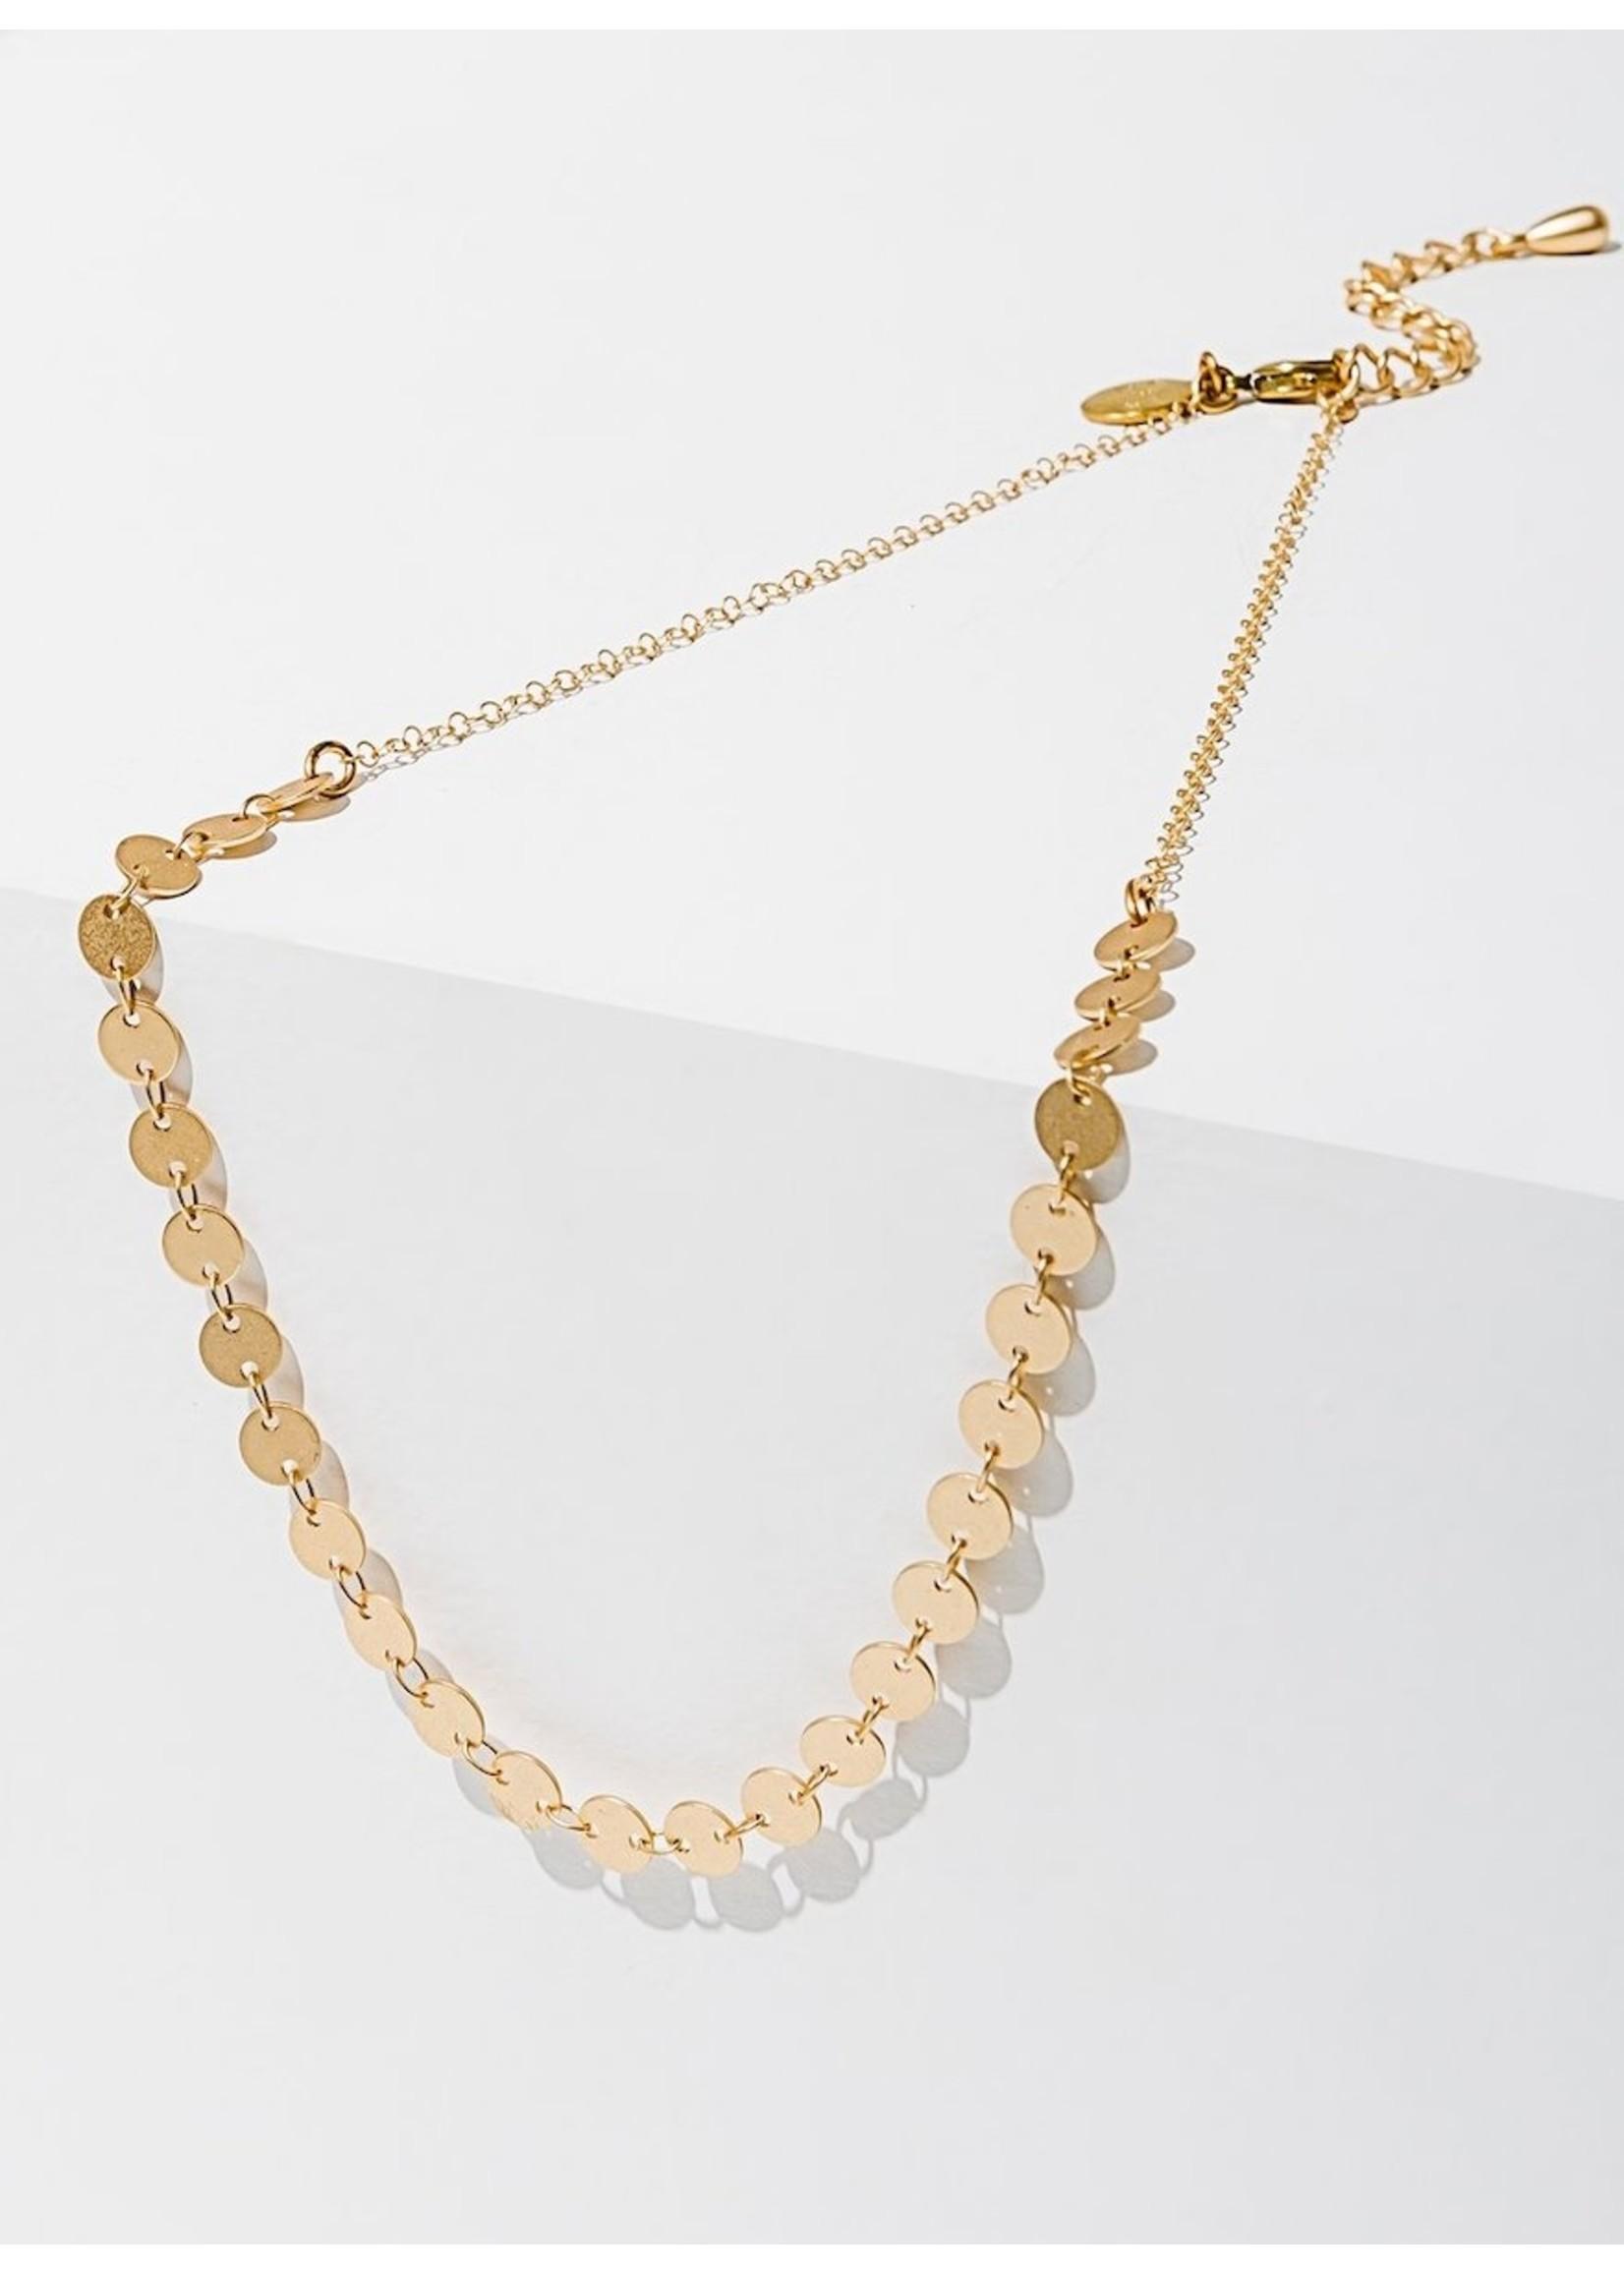 Larissa Loden Larissa Loden Candra Circles Necklace